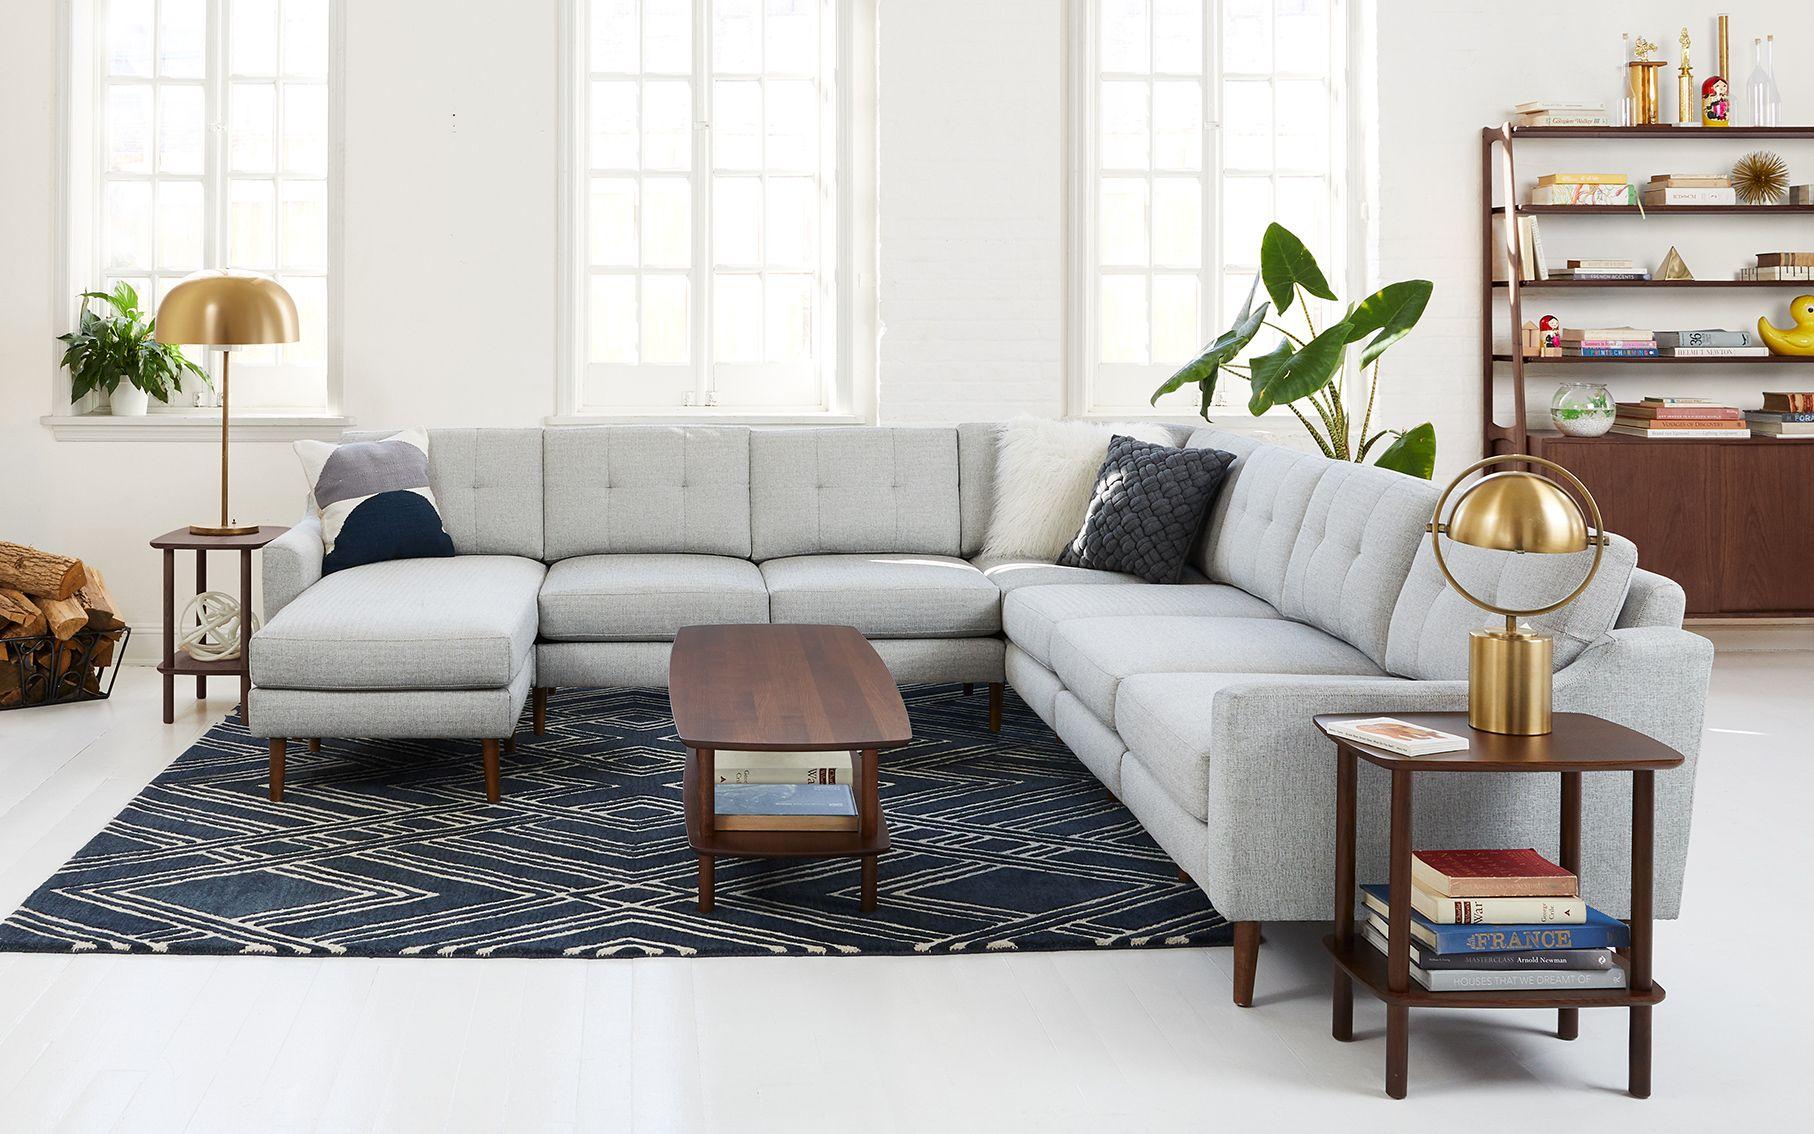 Serif Side Table Burrow Corner Sectional Sofa Design Coffee Table [ 1134 x 1814 Pixel ]